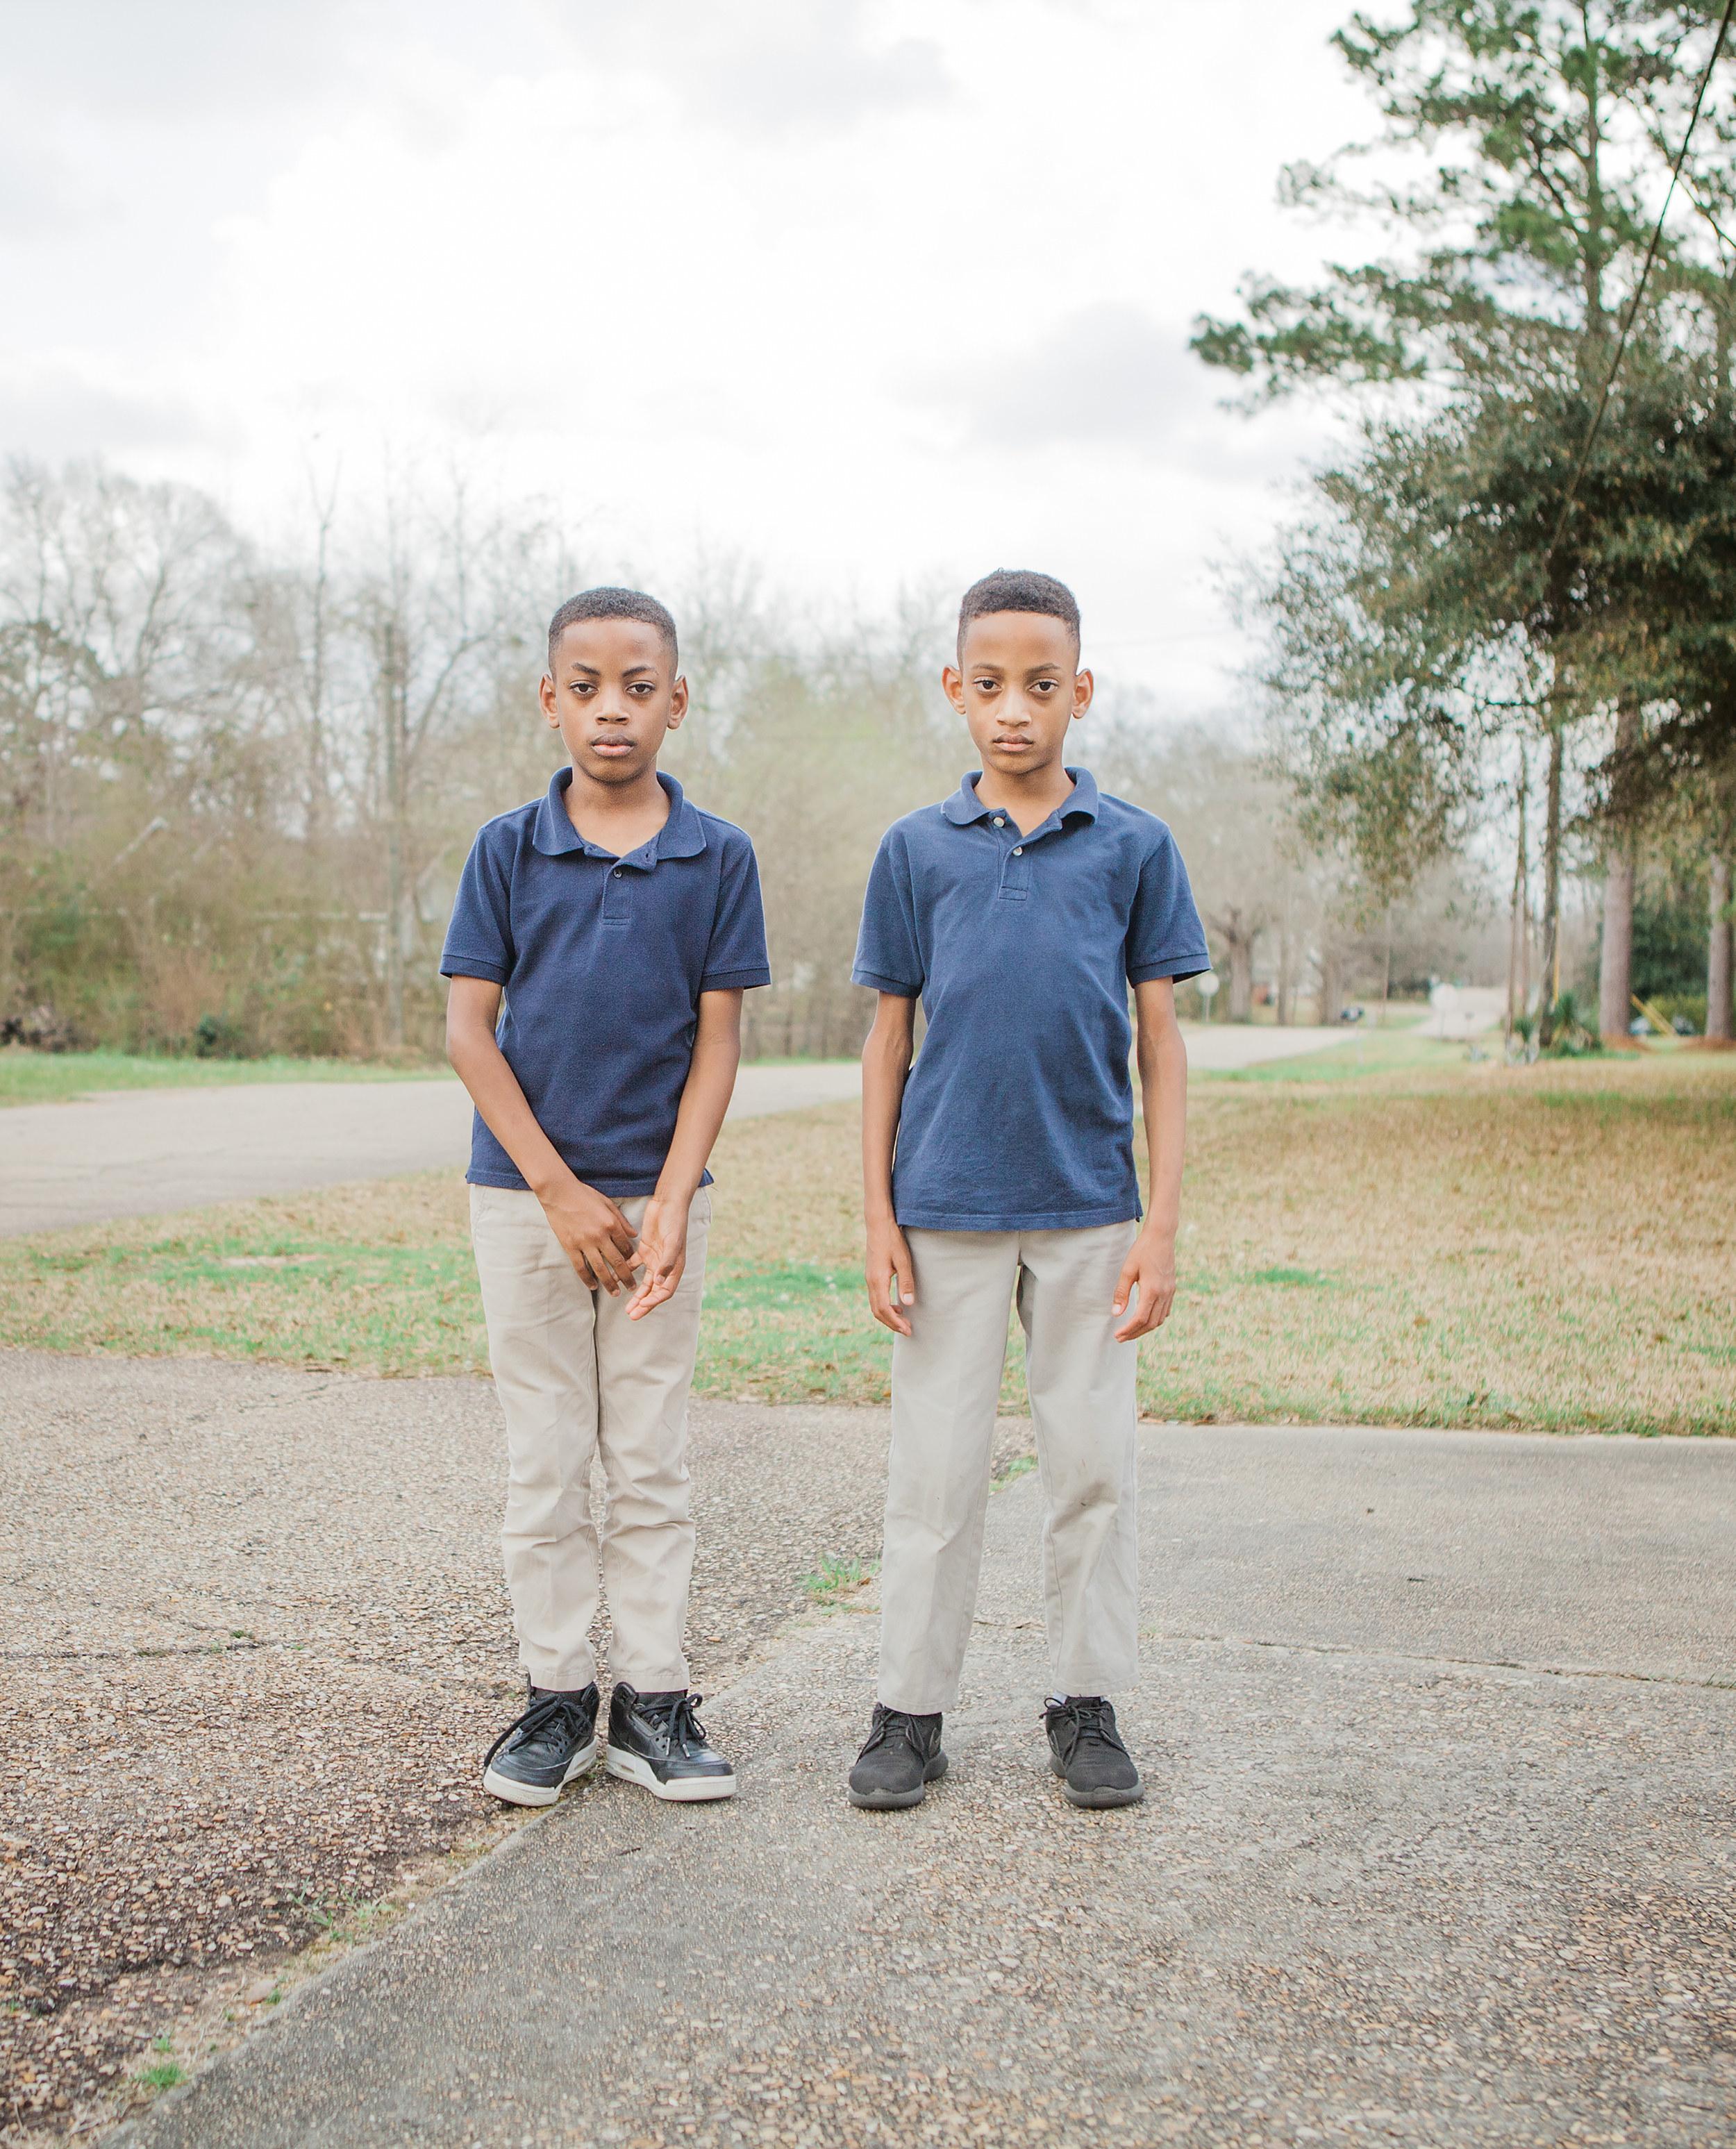 Two young boys in school uniforms on a sidewalk